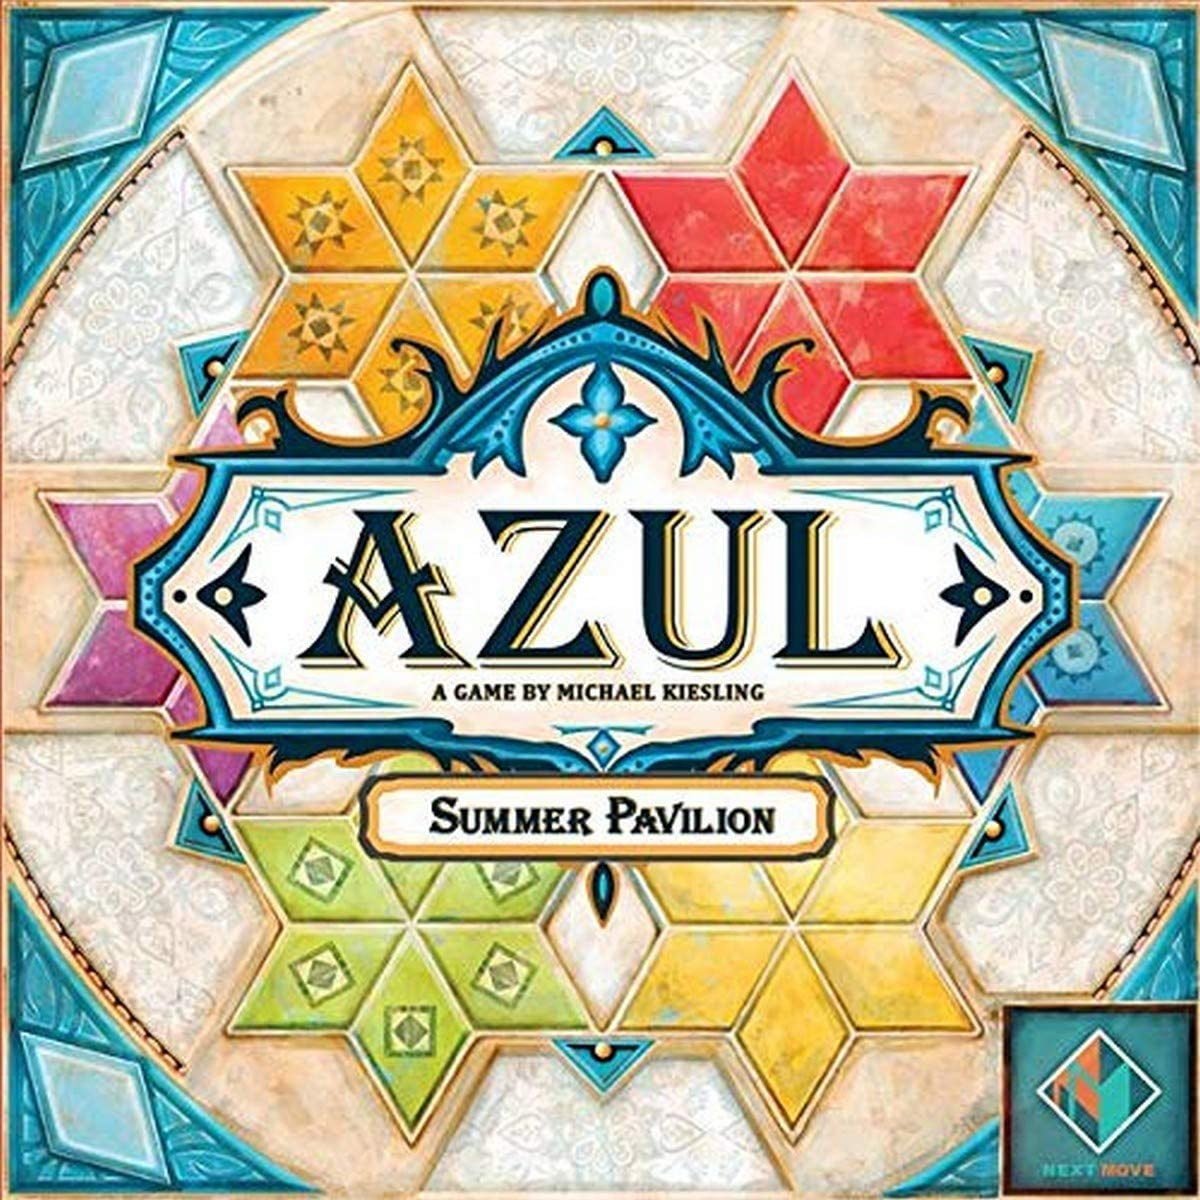 Azul Summer Quantity limited Pavilion Max 81% OFF